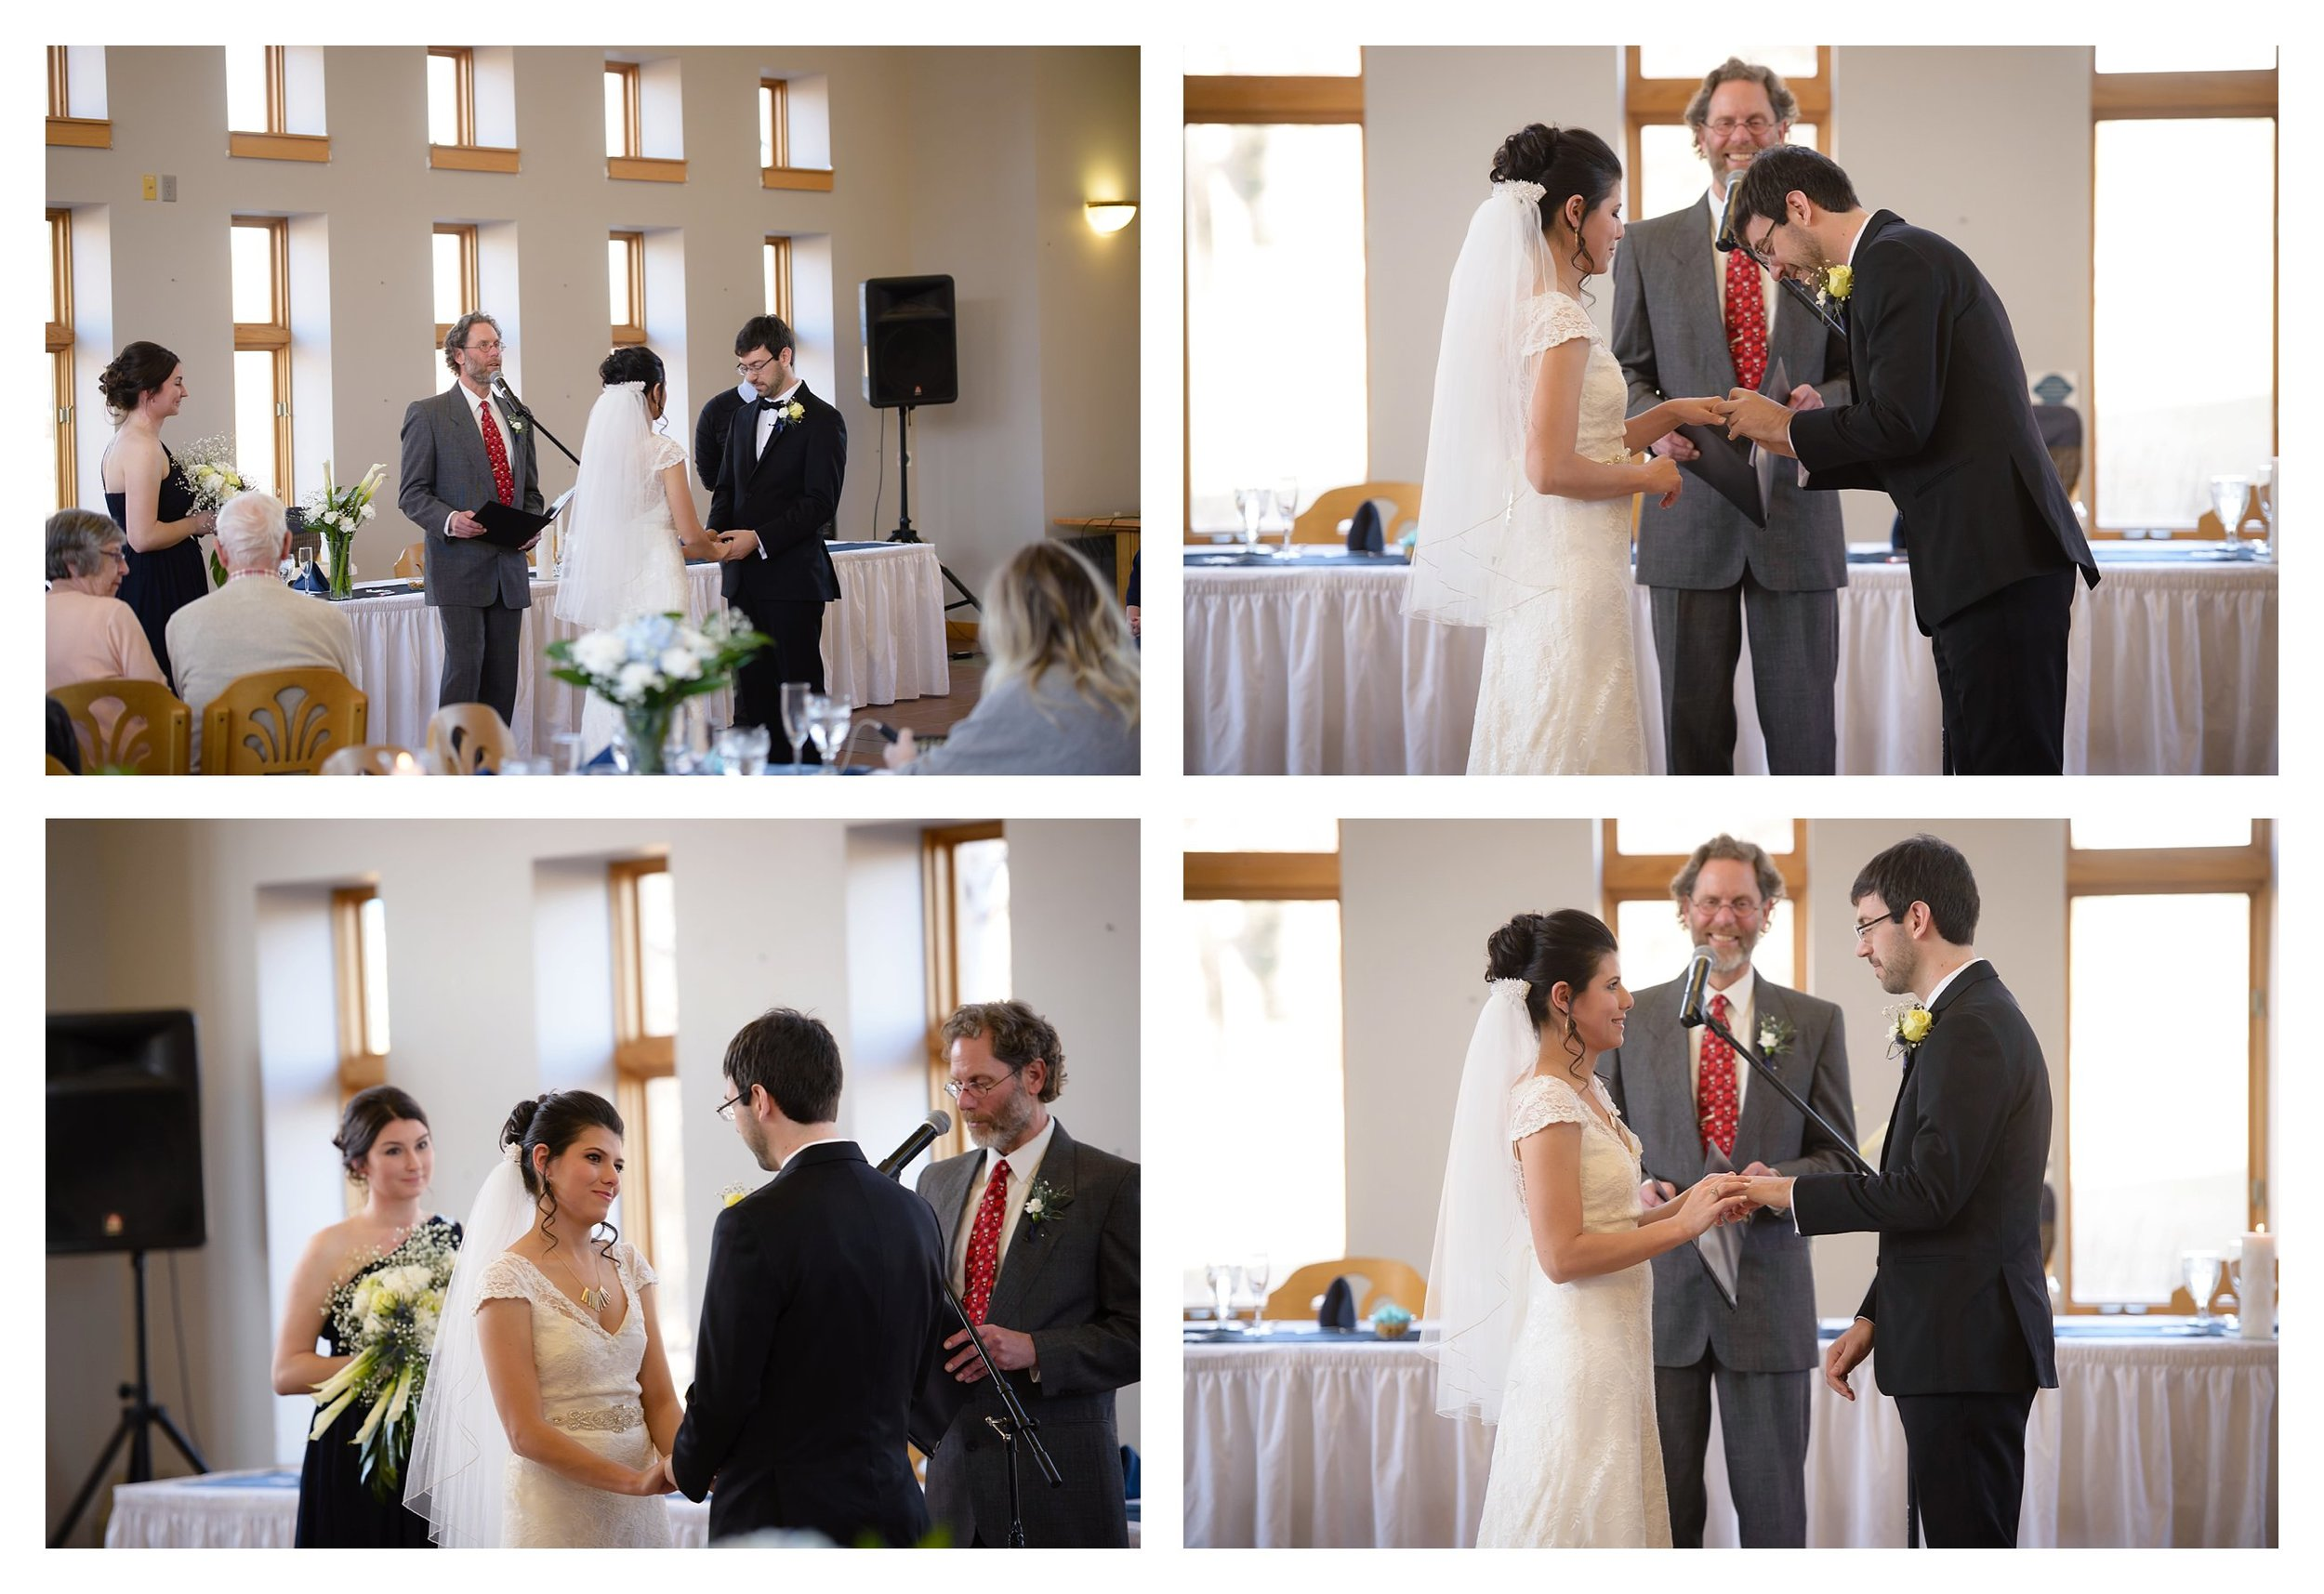 ashland wedding photographer iron river brule wisconsin ps 139 photography jen jensen_0132.jpg